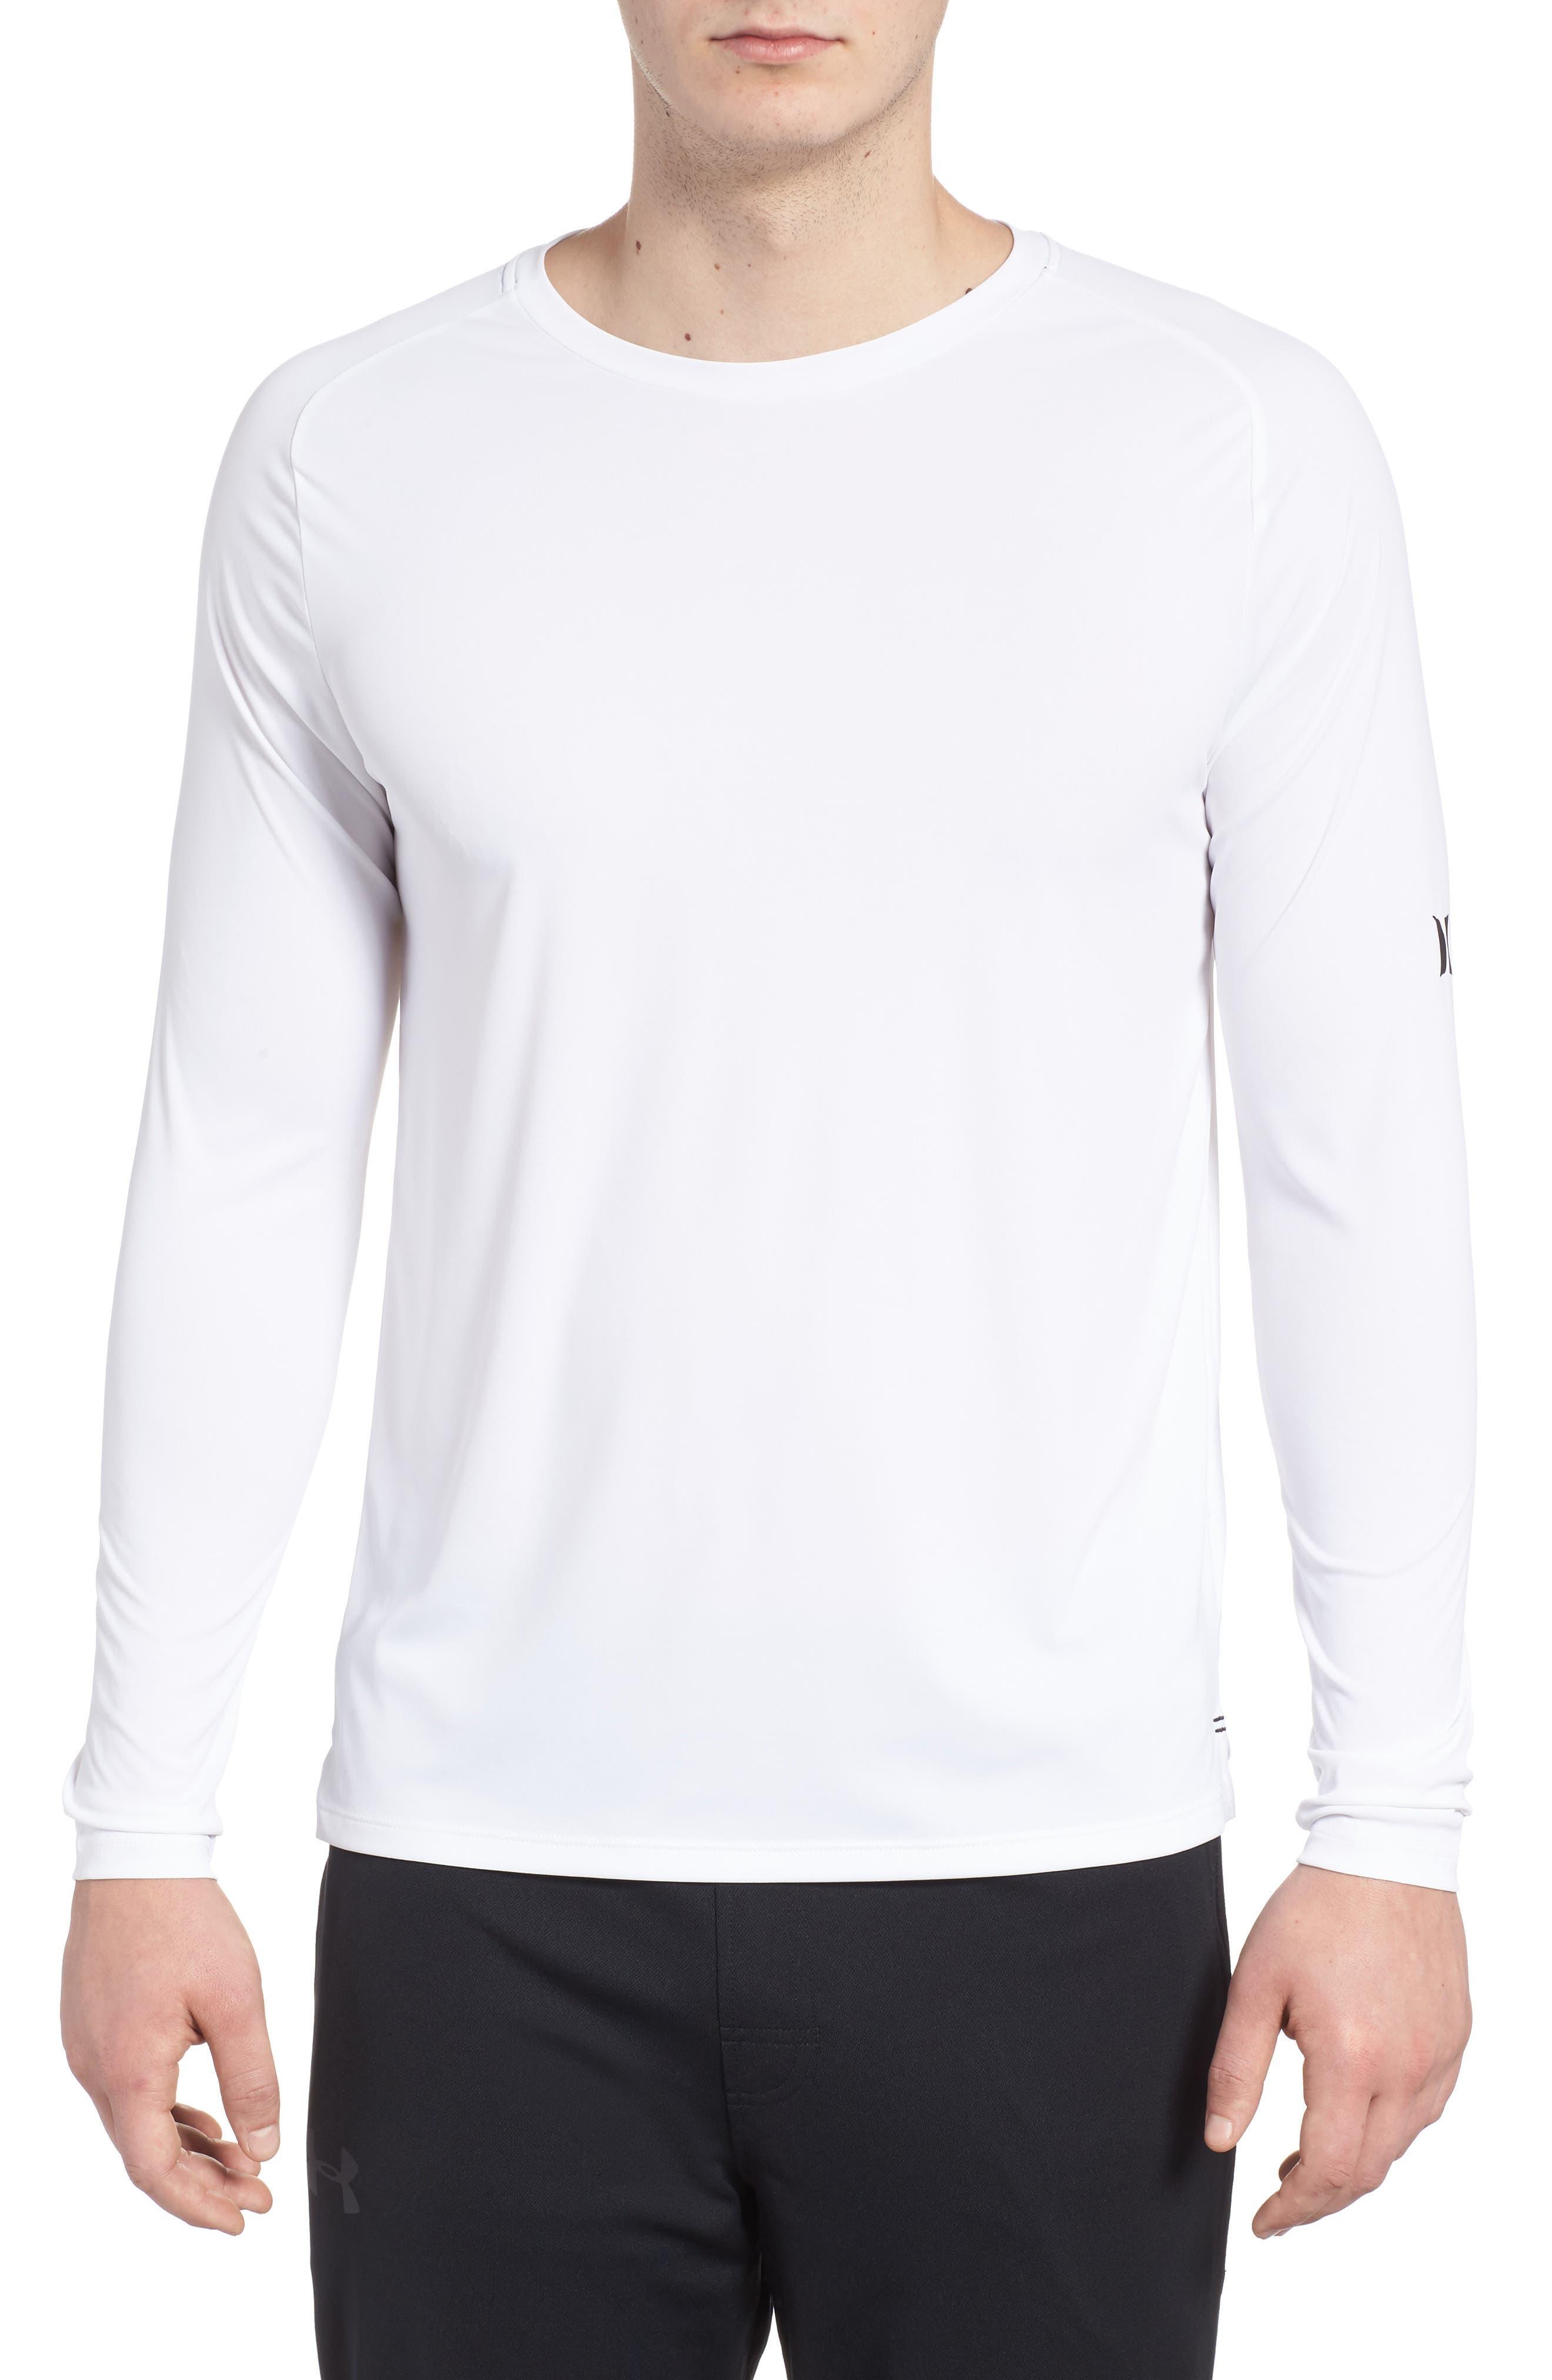 Icon Surf Shirt,                             Main thumbnail 1, color,                             White